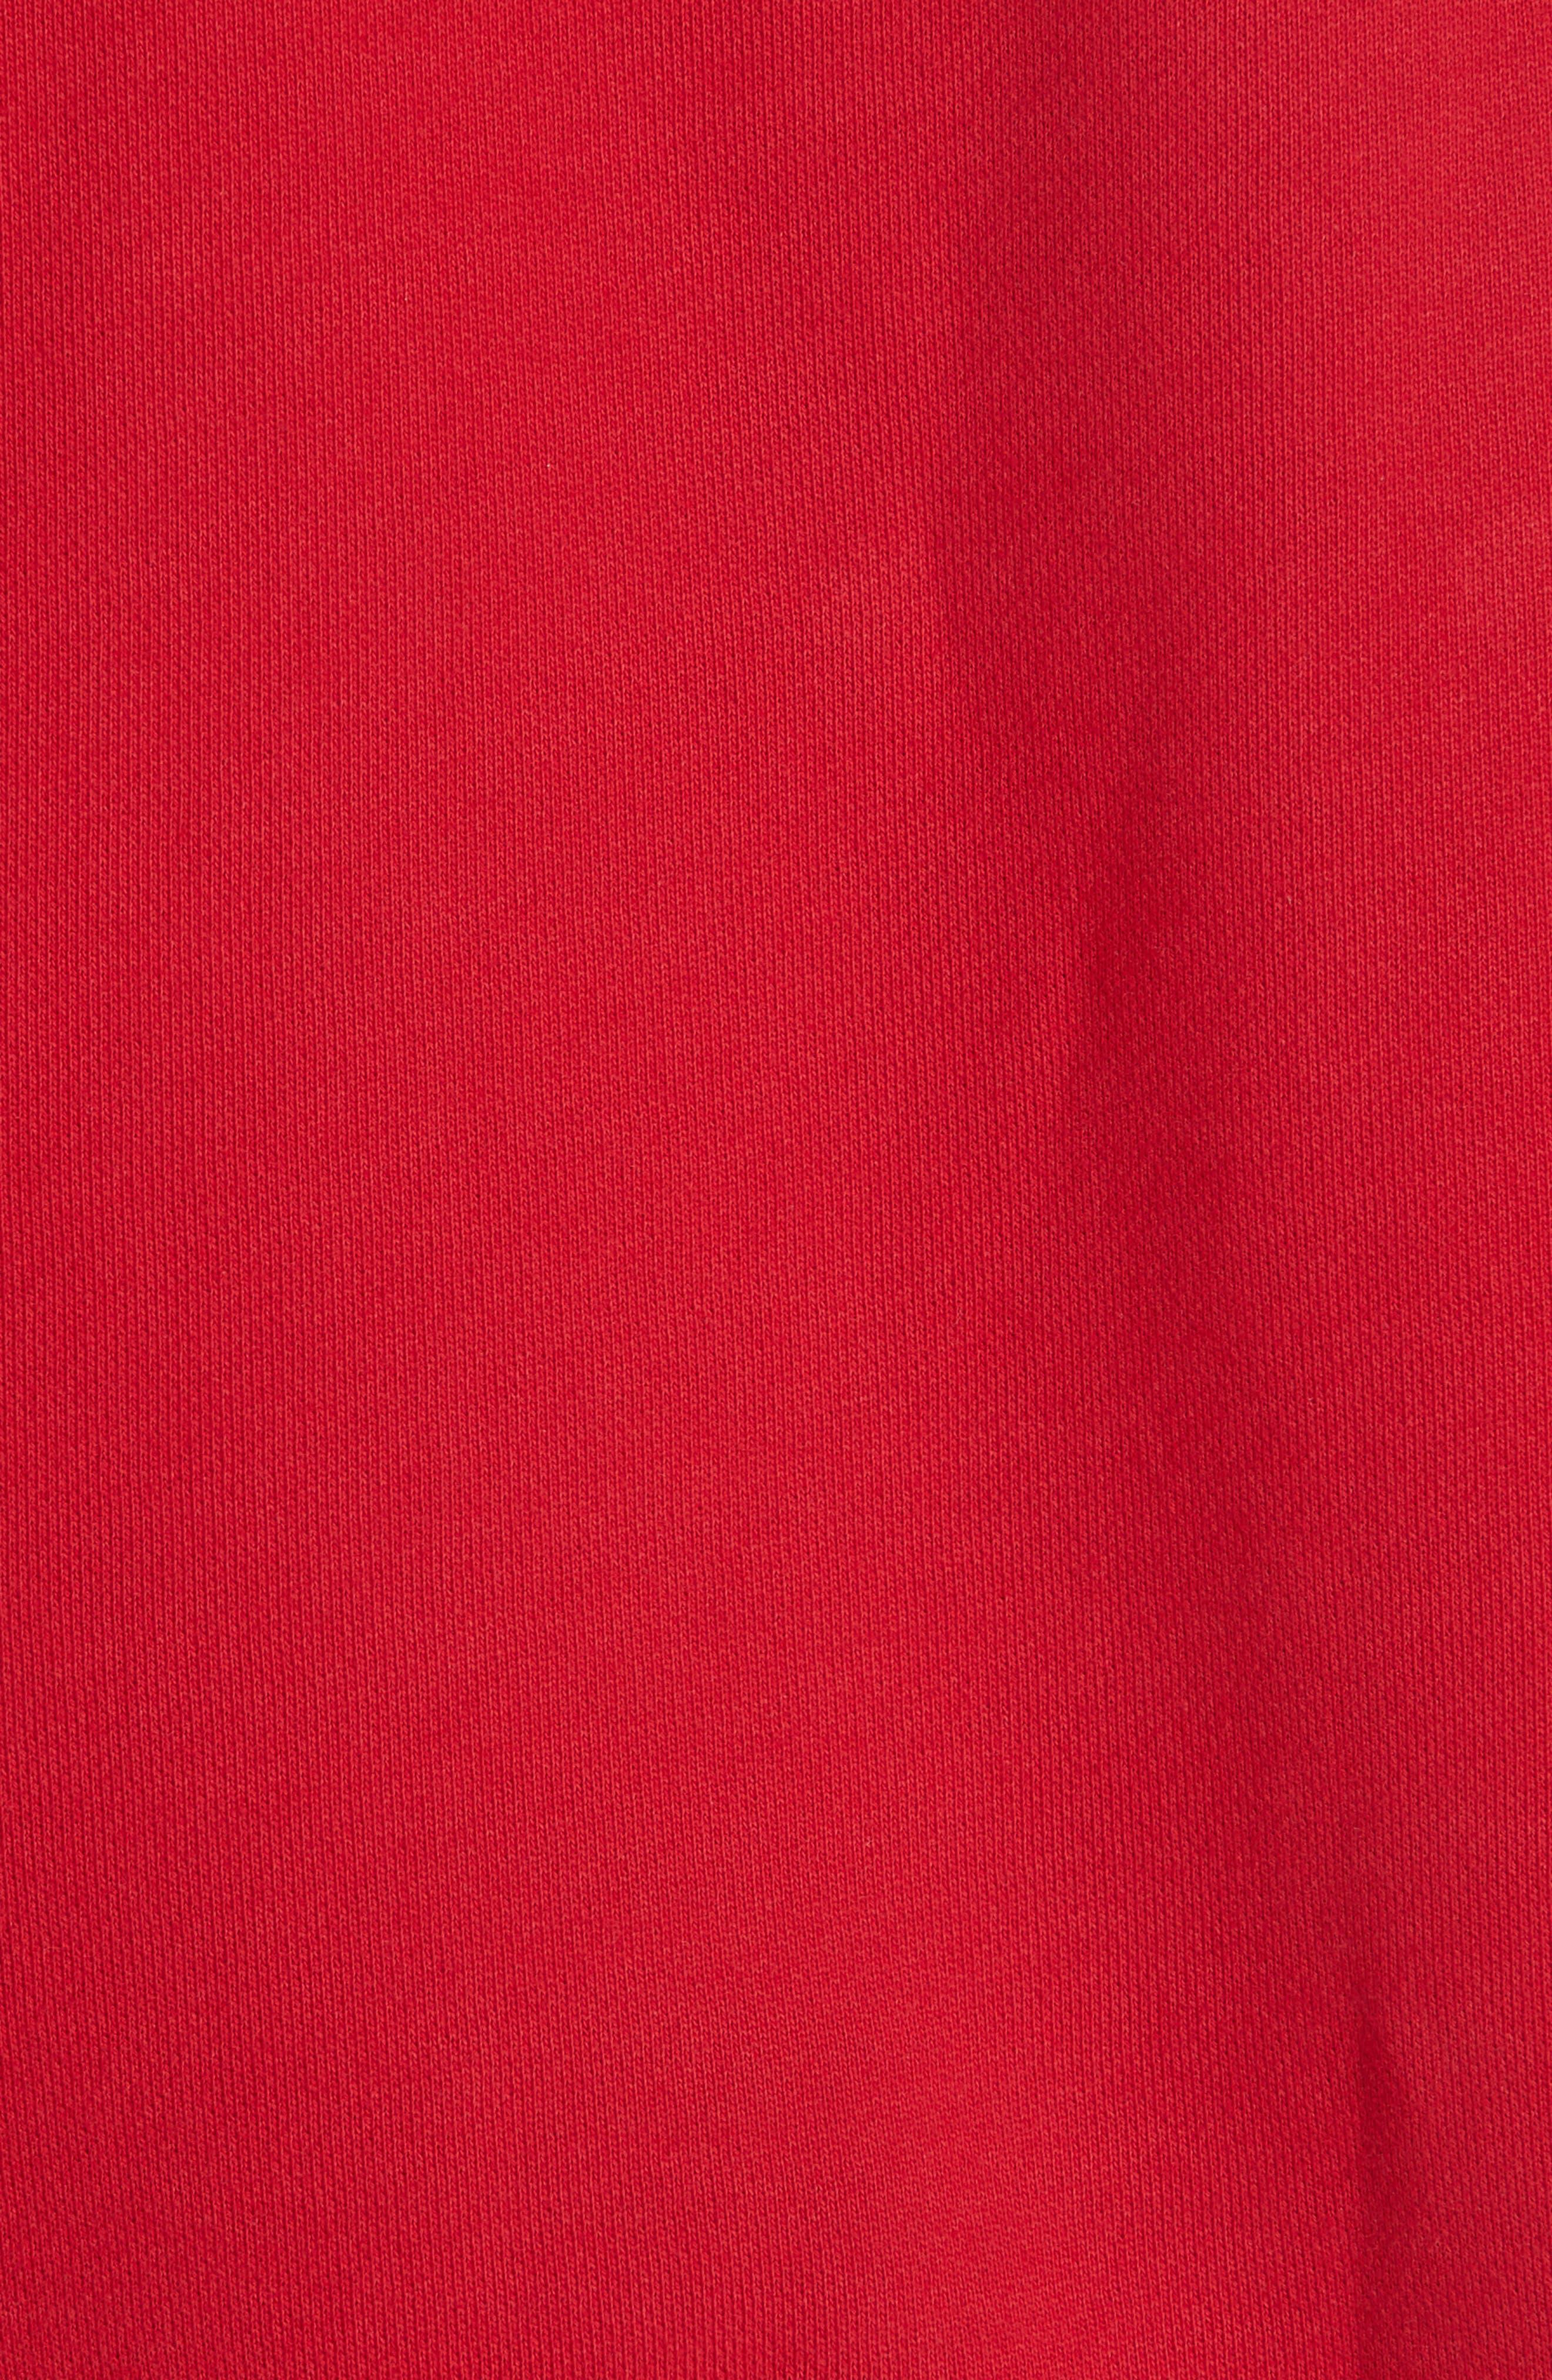 MOSCHINO, Circus Teddy Sweatshirt, Alternate thumbnail 6, color, RED